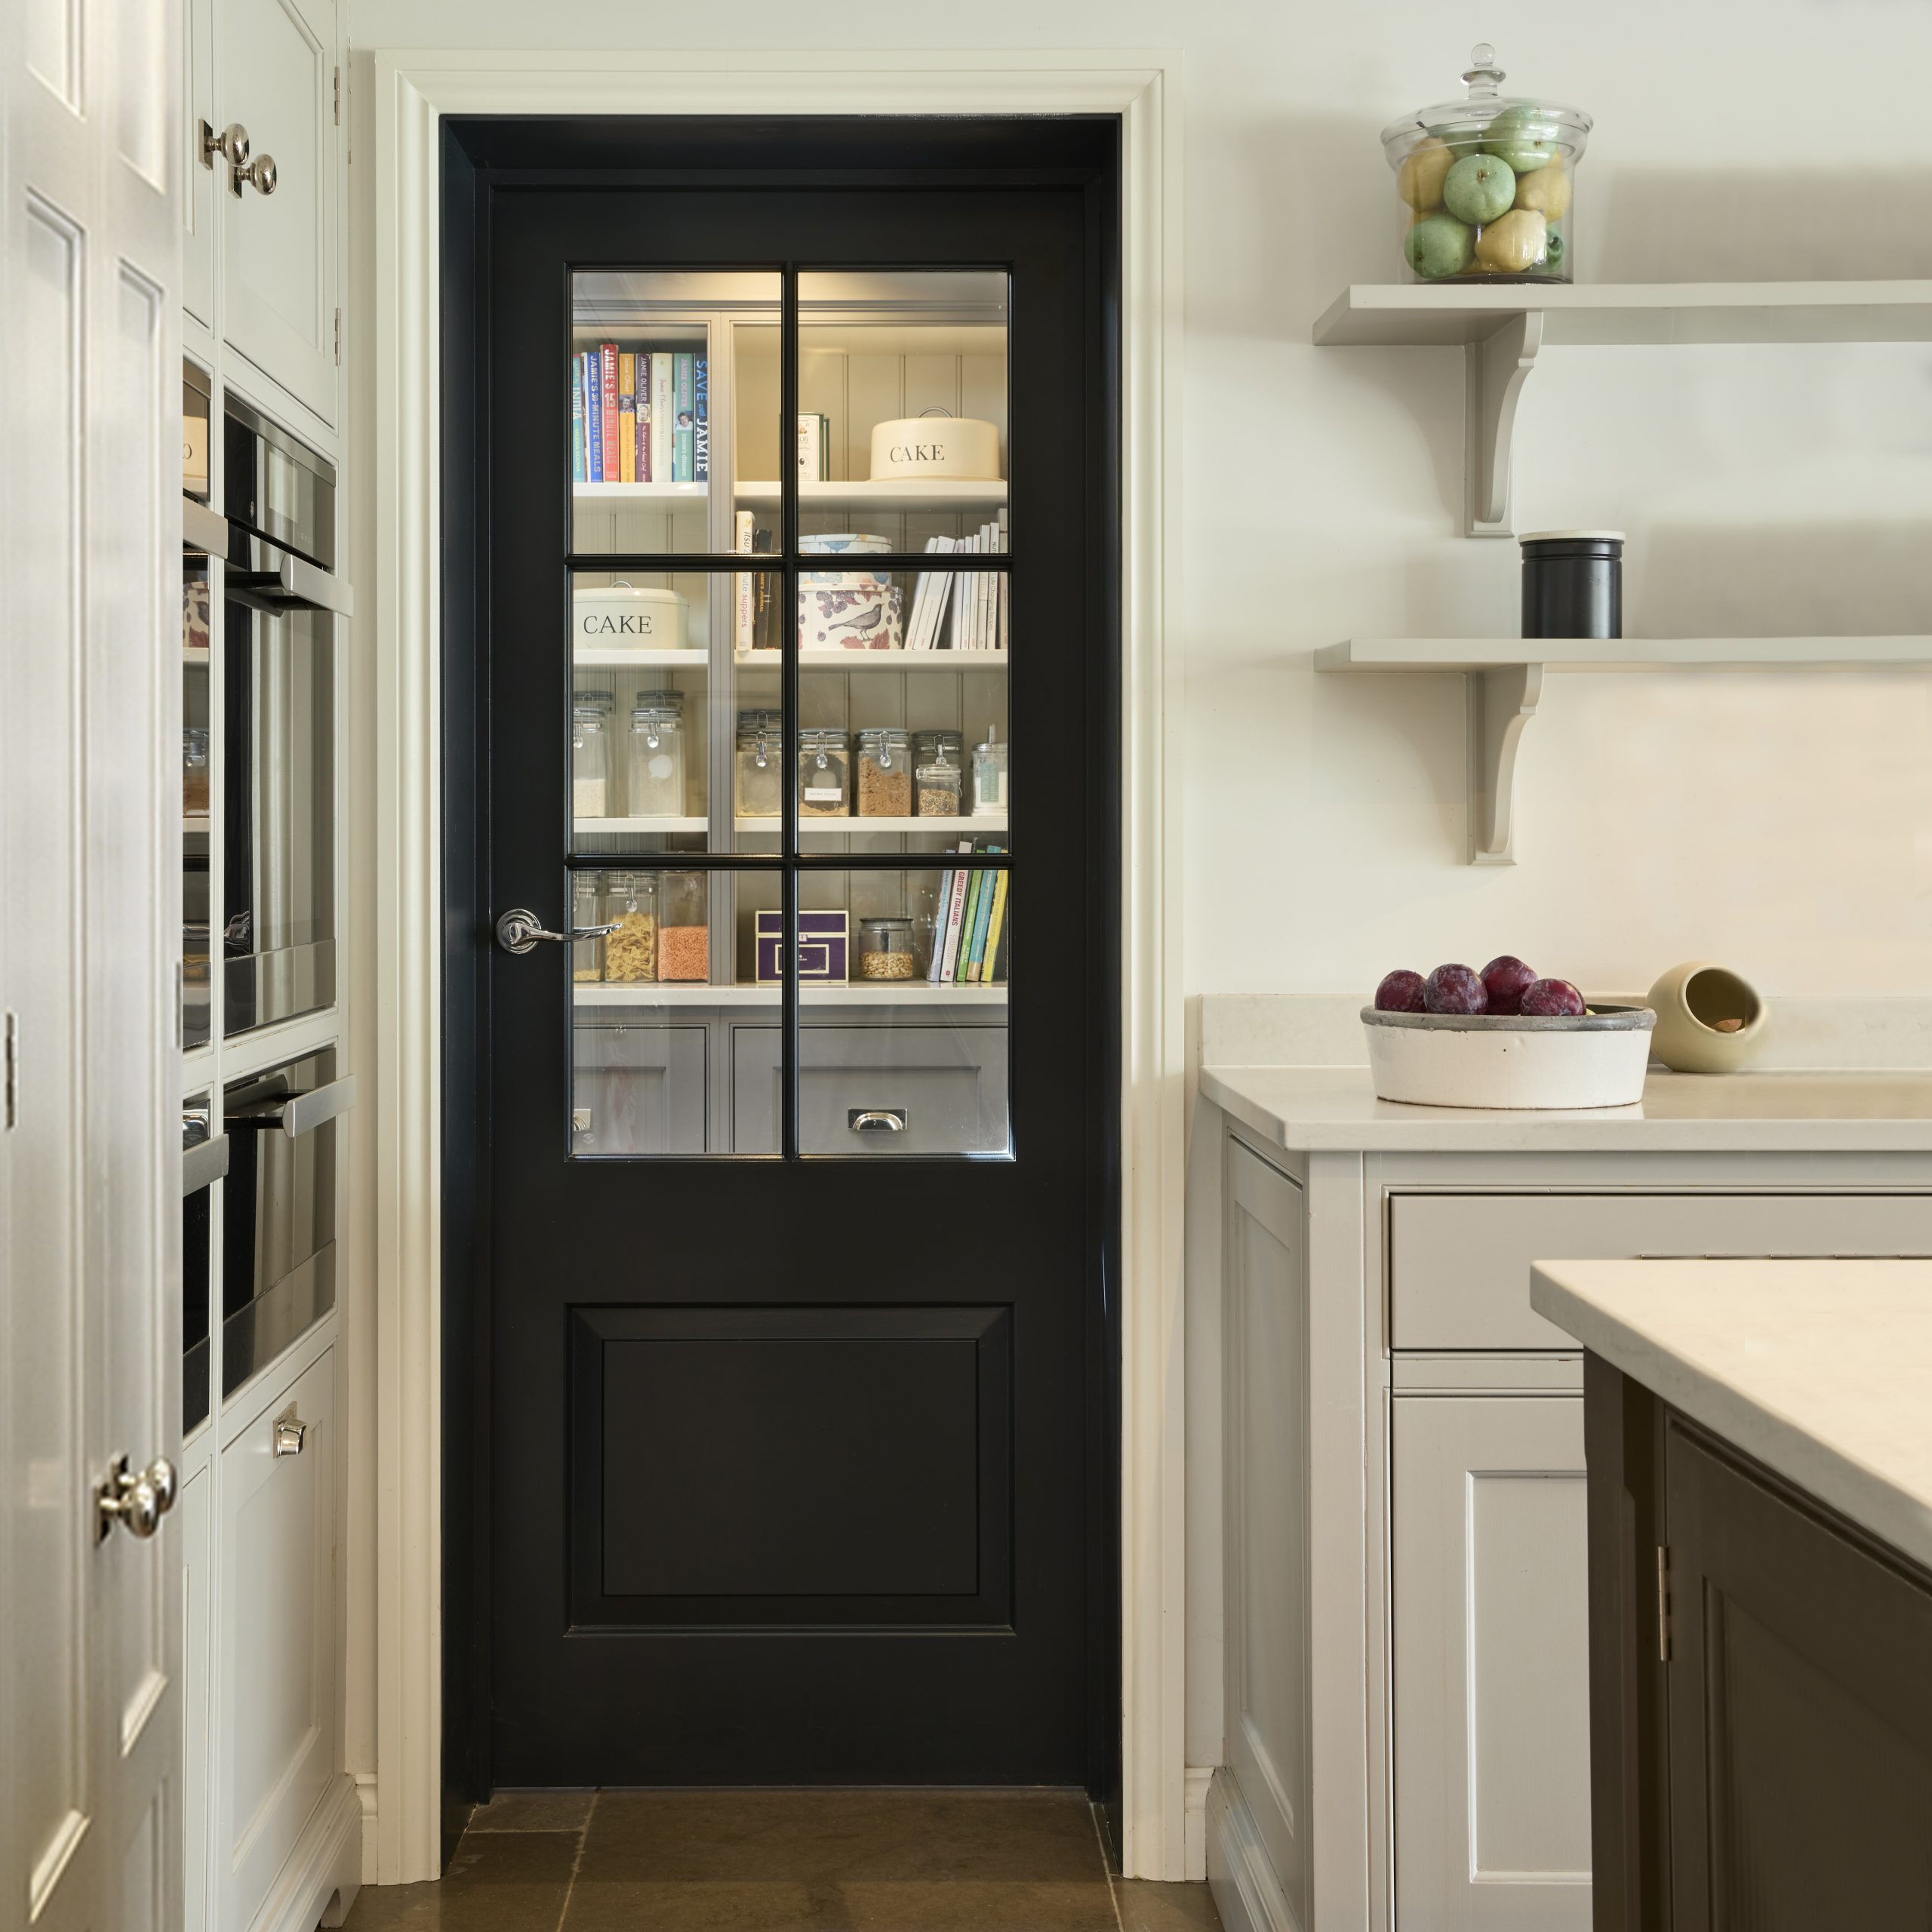 Elegant Kitchen Pantry Ideas – How to design the perfect pantry